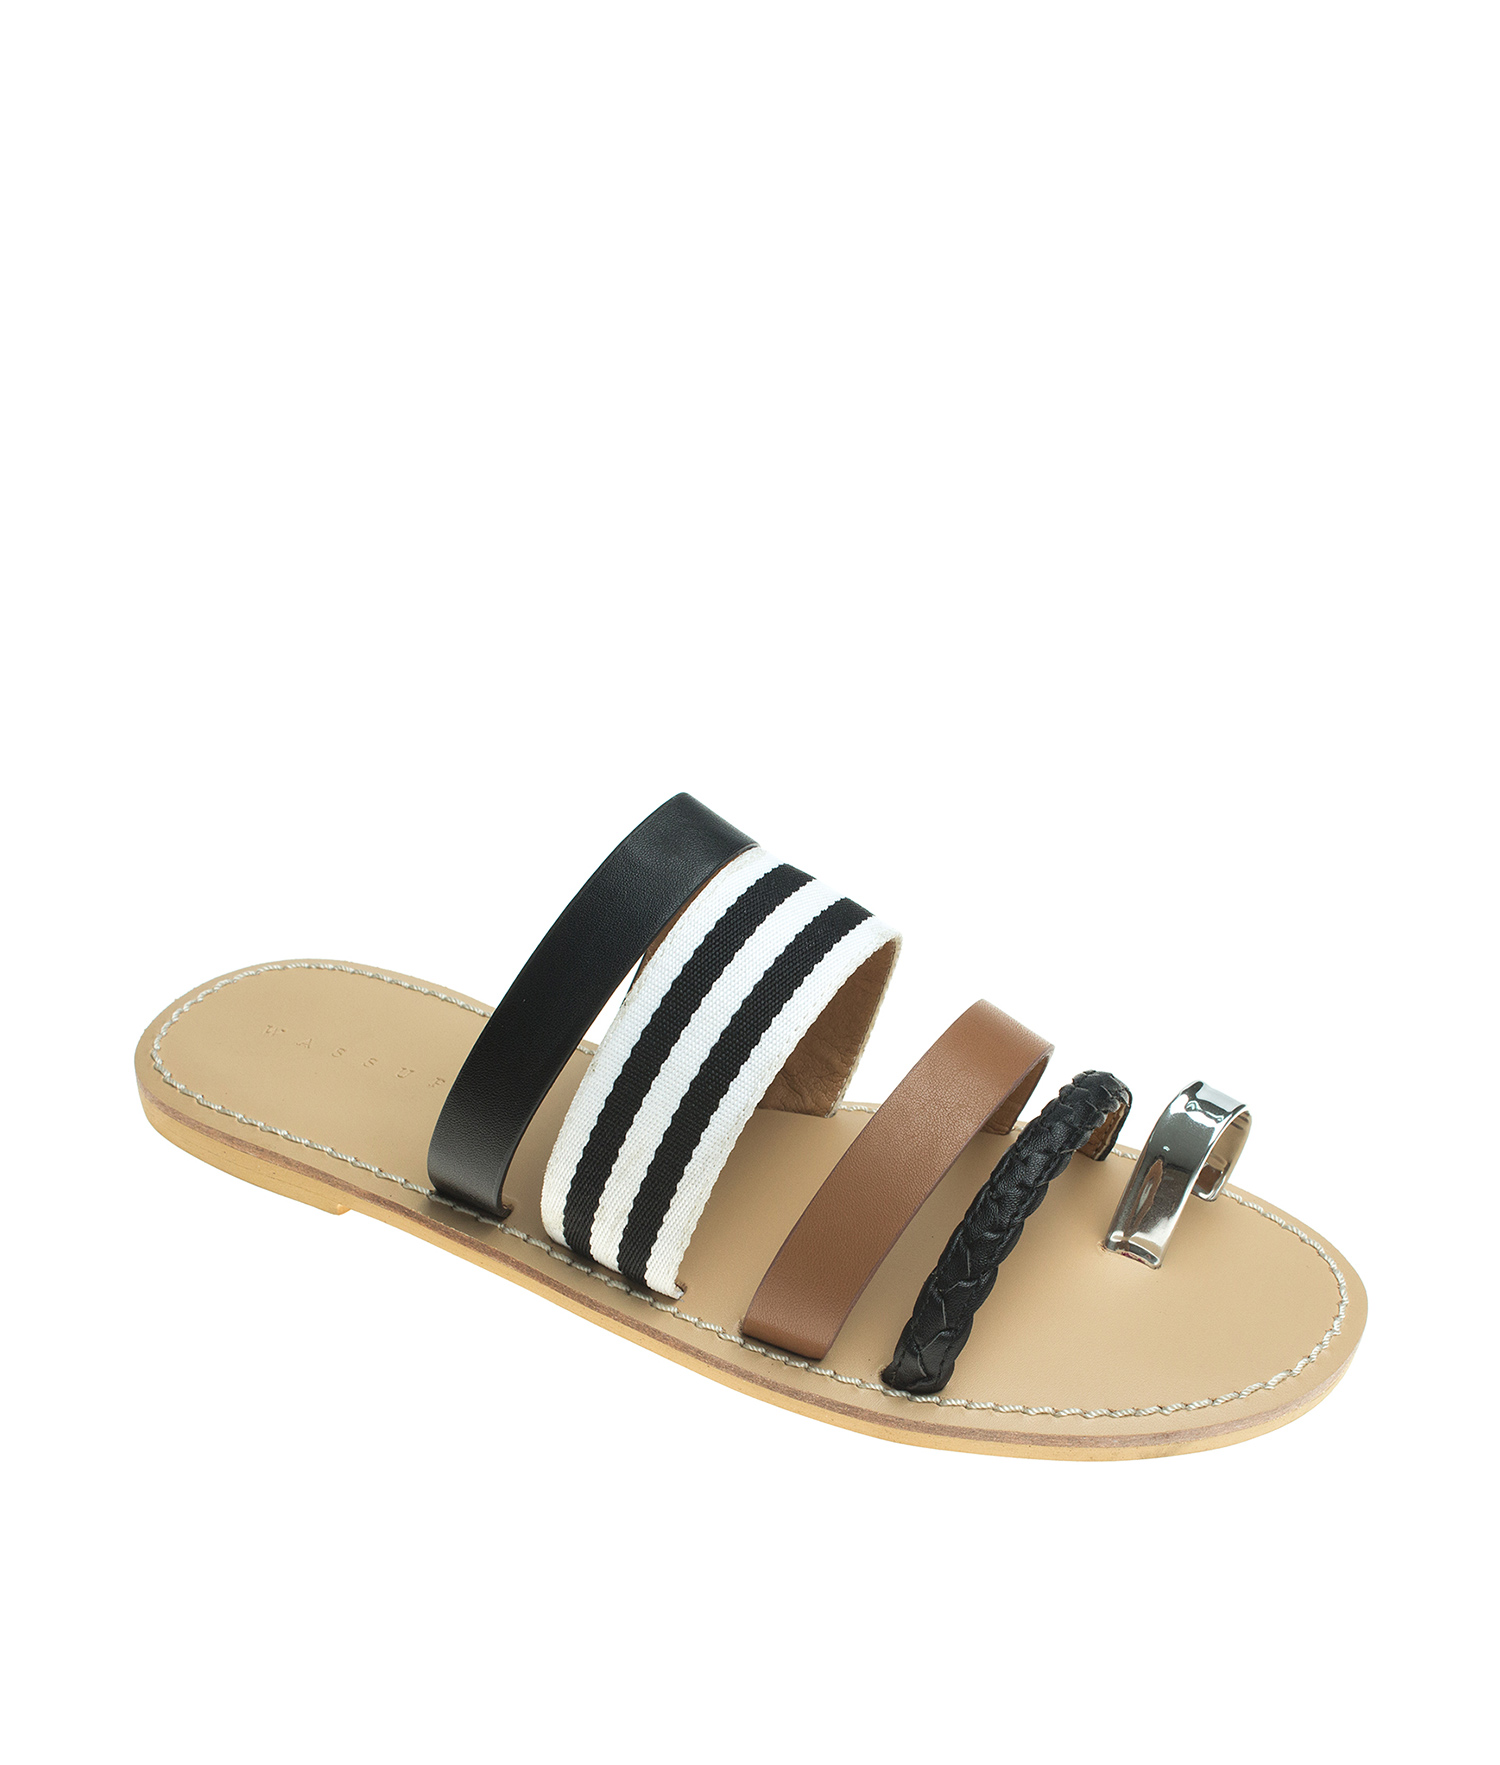 449fb575b AnnaKastle Womens Kumi Toe Ring Strappy Flat Slide Sandals Black